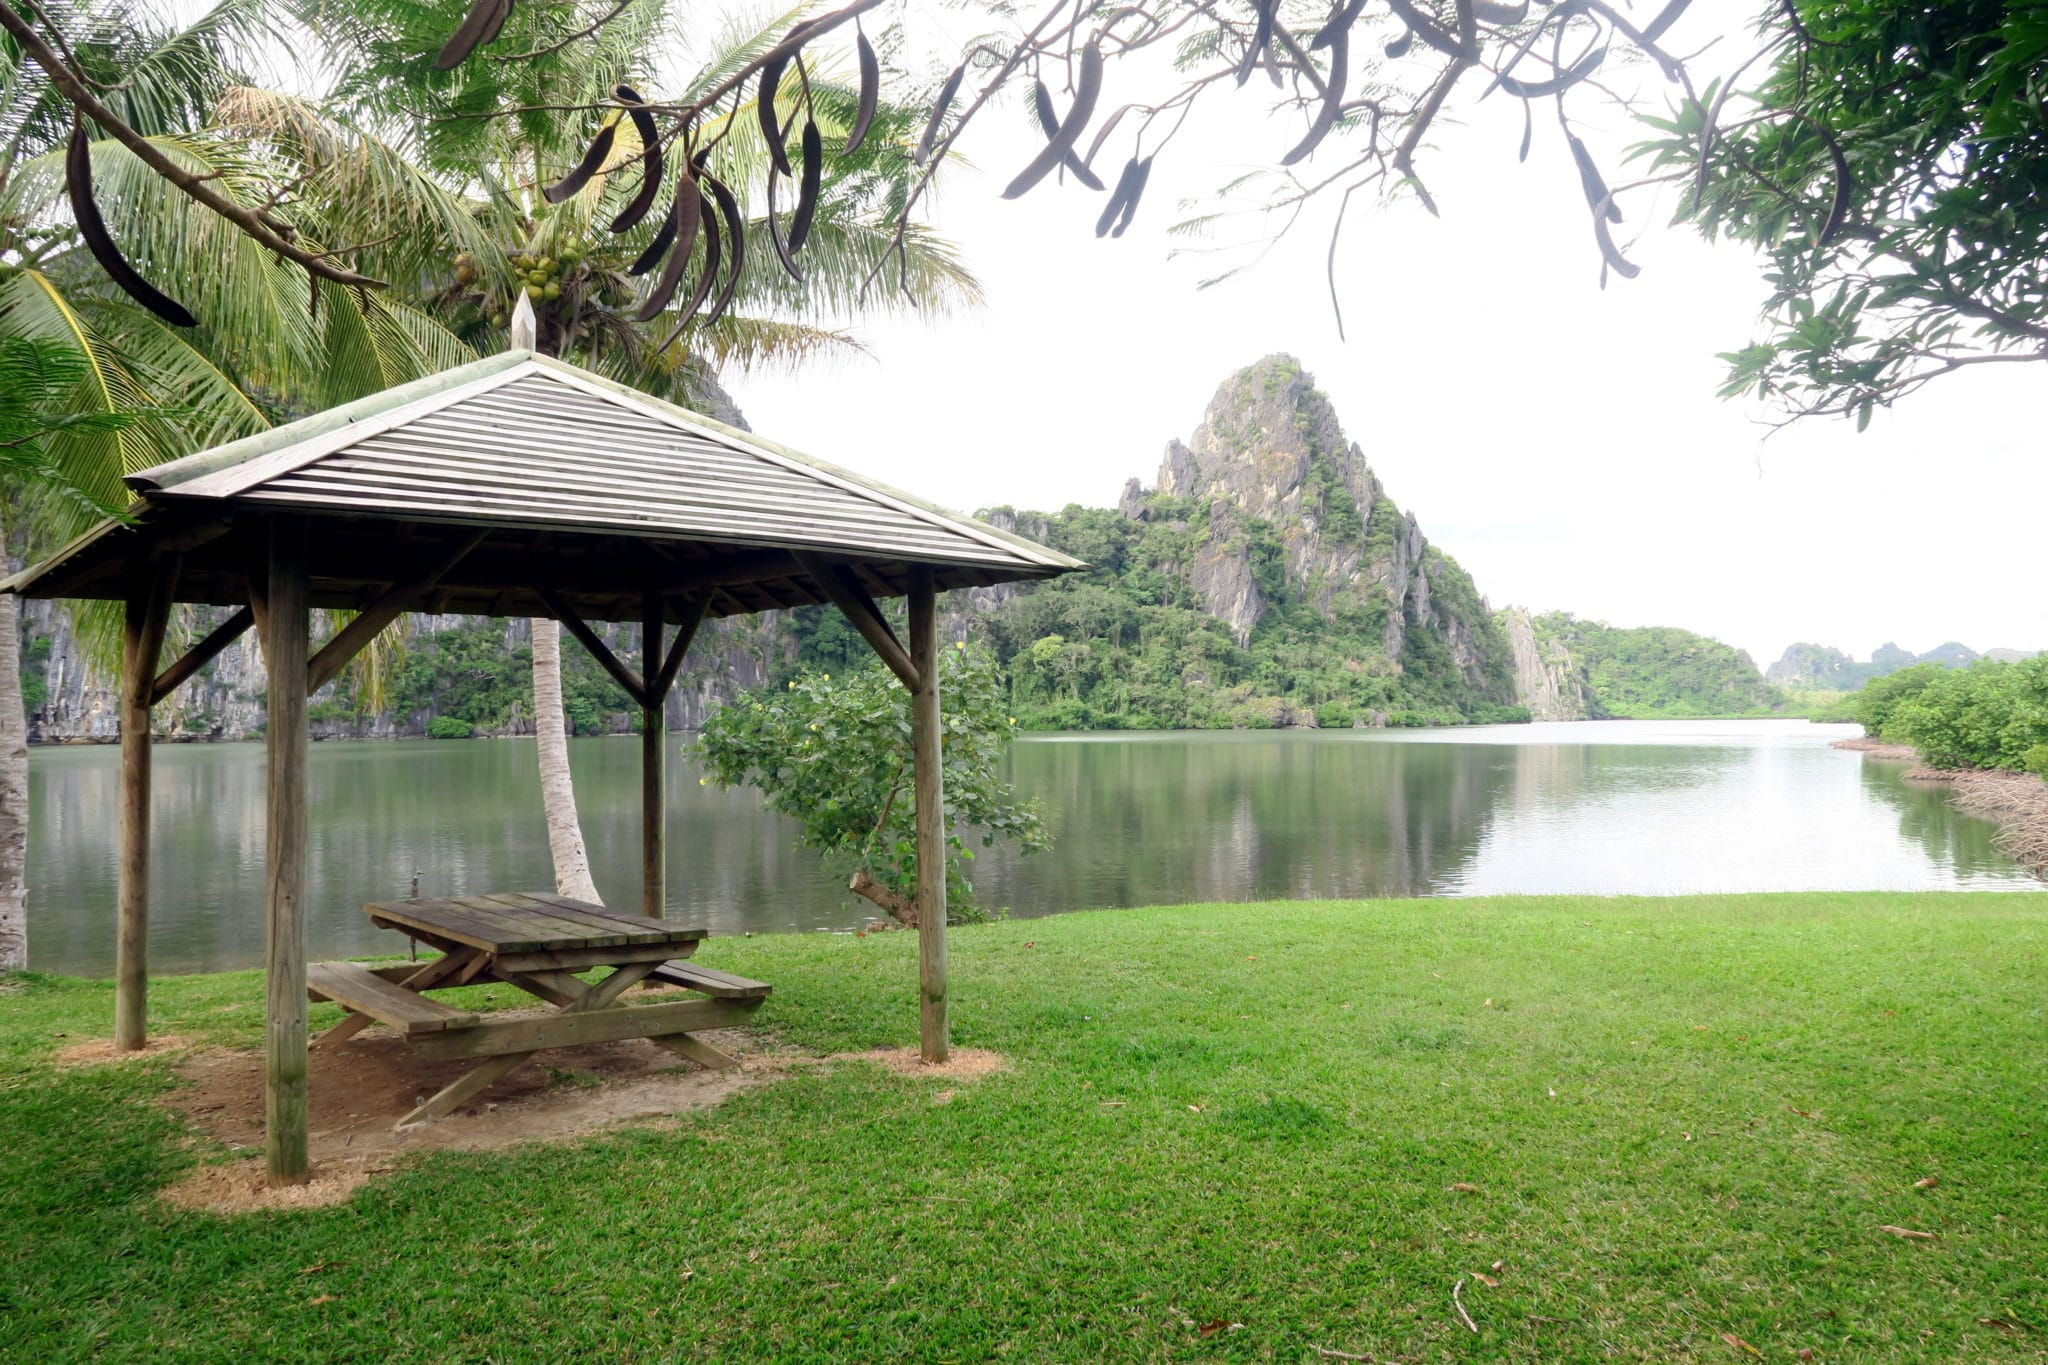 Linderalique Lagoon - Exploring Hienghene New Caledonia